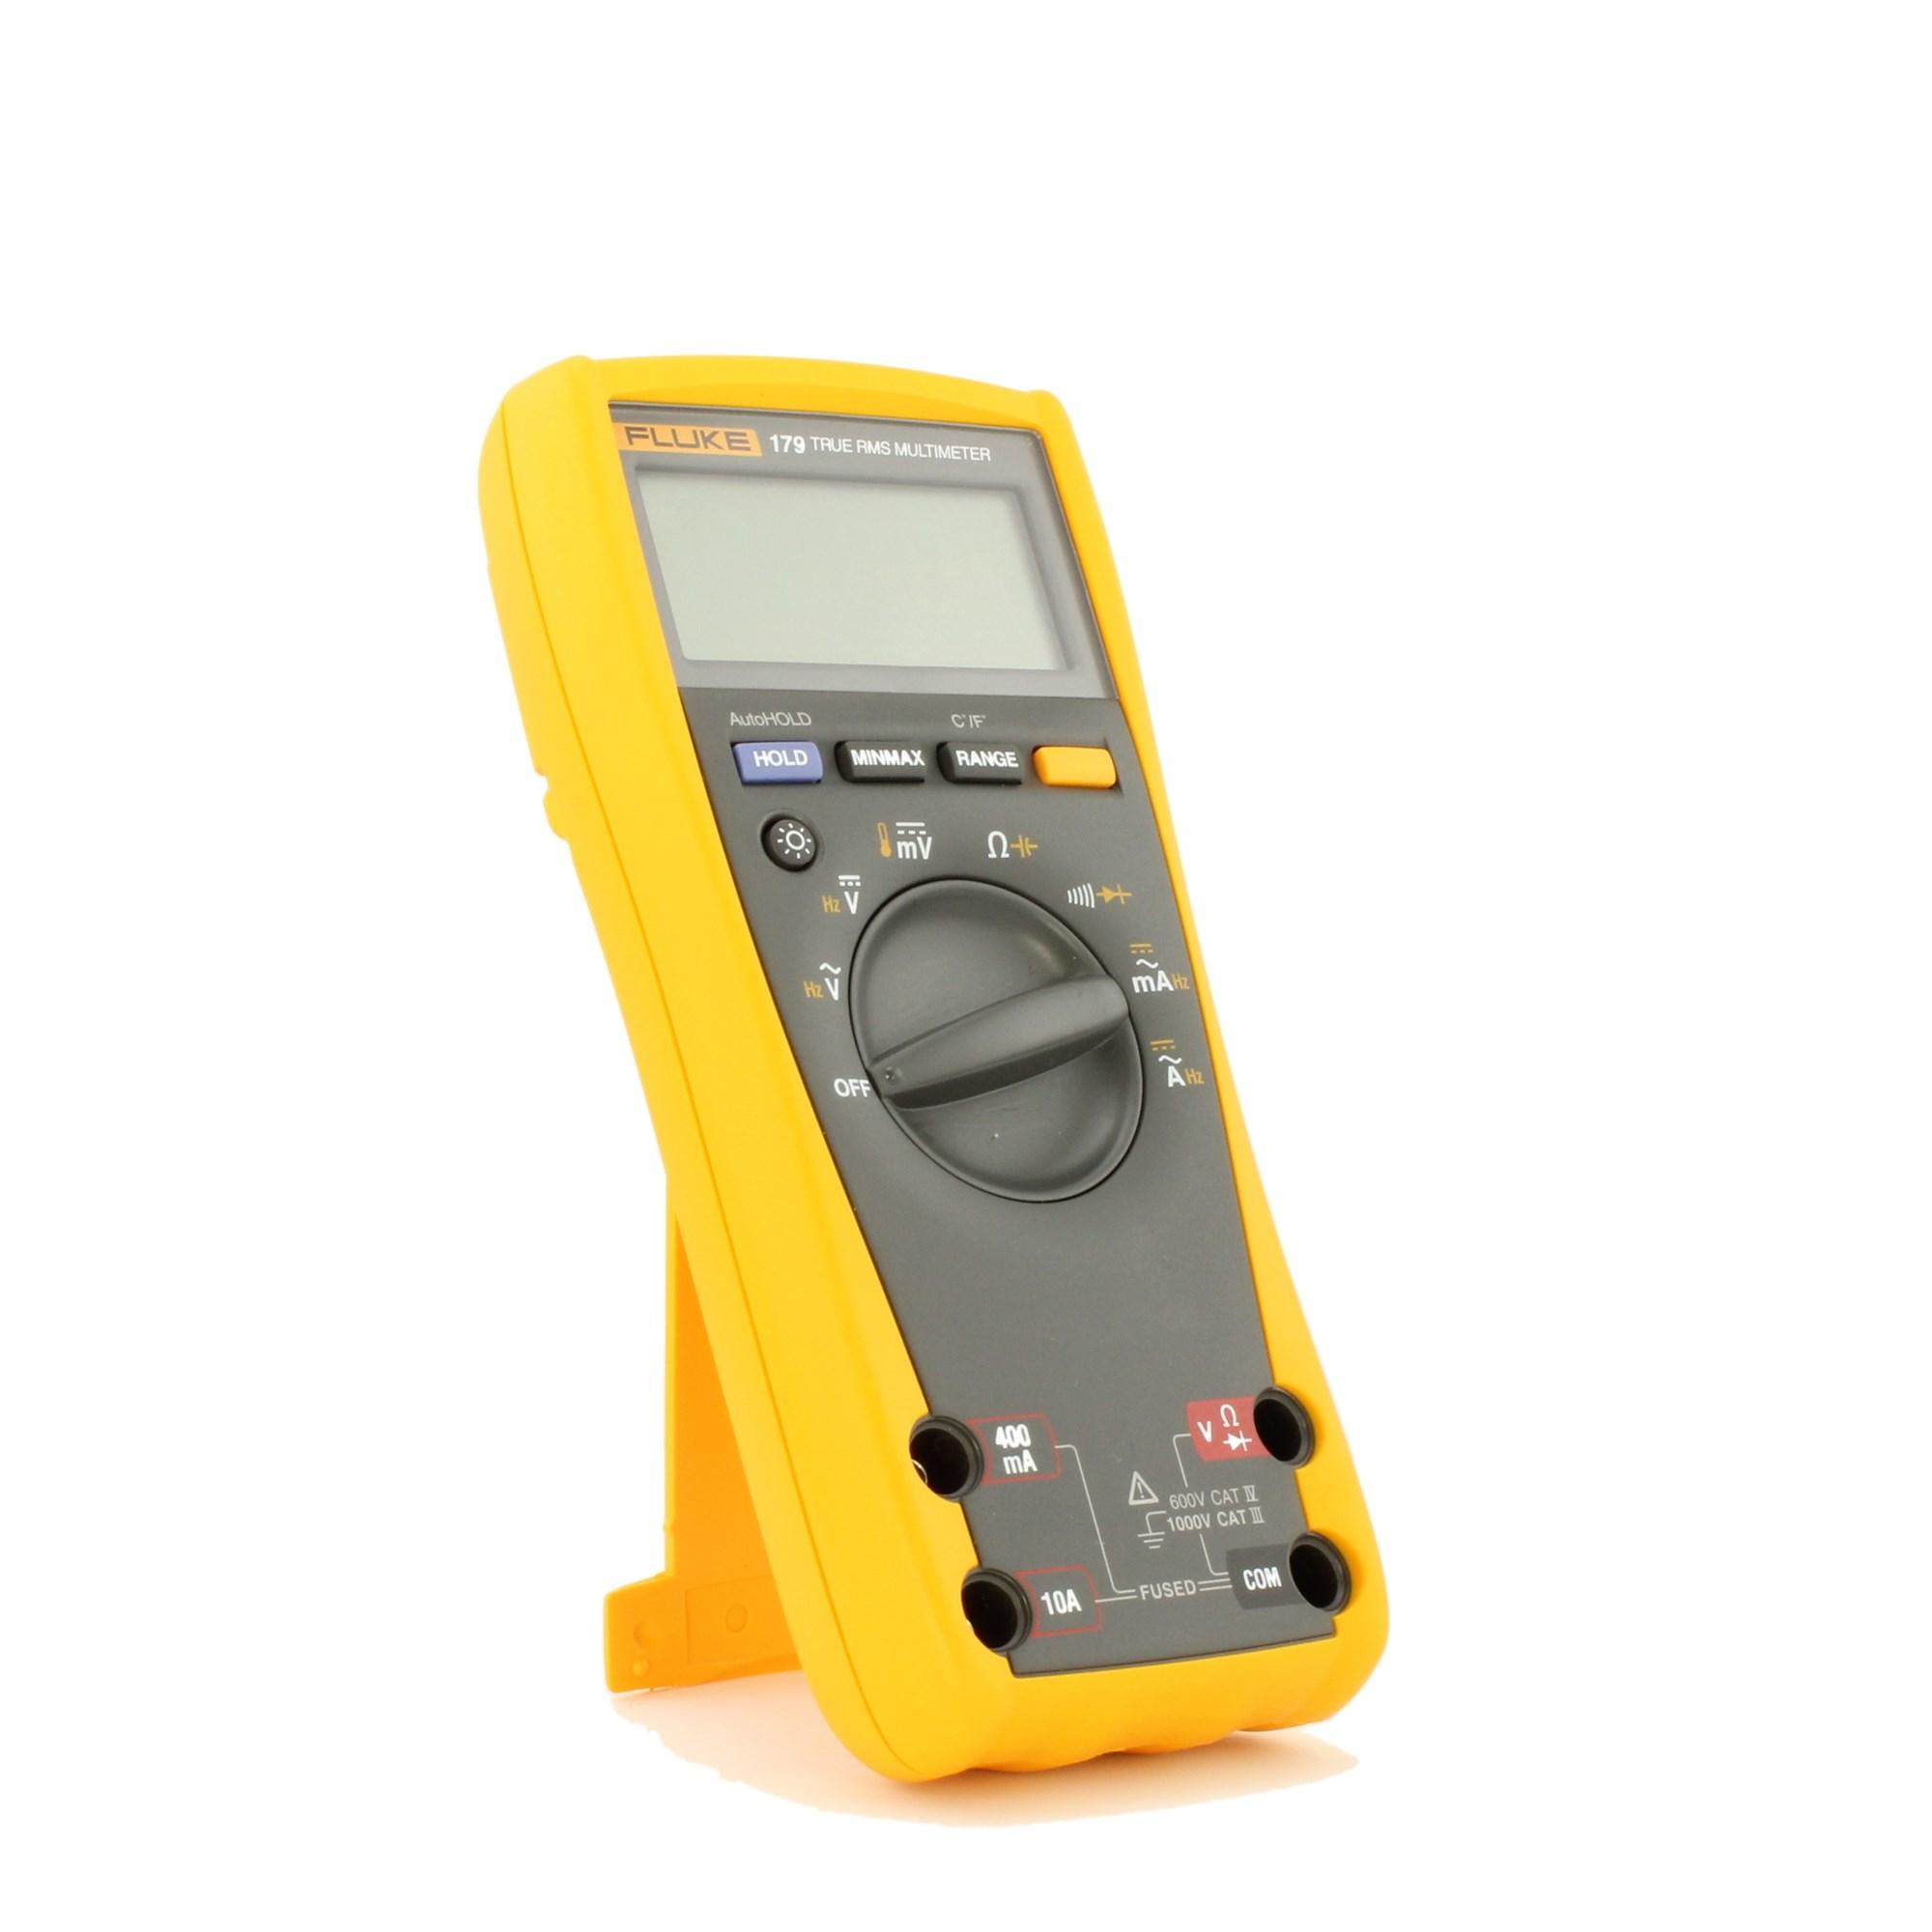 Fluke 179 Digital Multimeter 6000 Count DMM with Backlight & Temperature  Measurement | TEquipment.NET